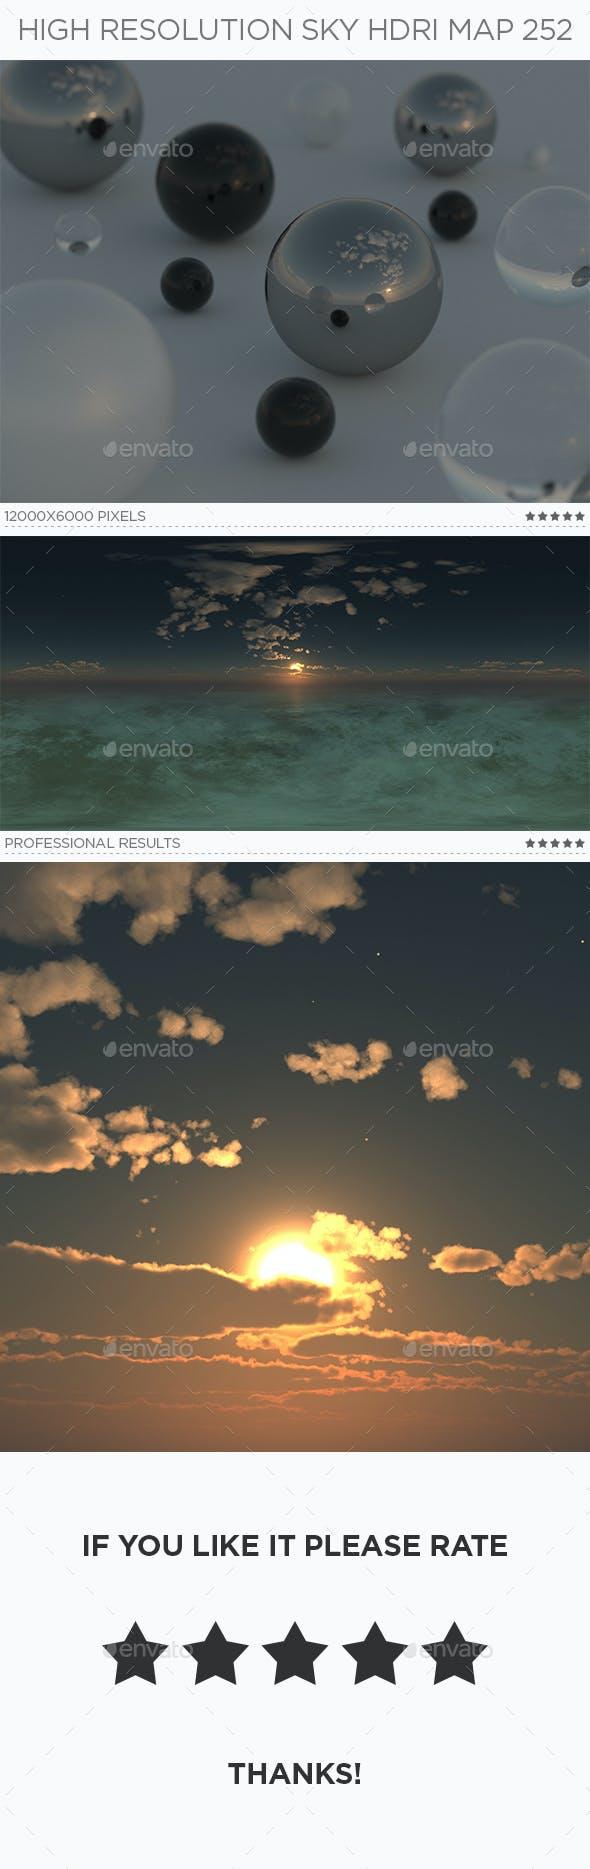 High Resolution Sky HDRi Map 252 - 3DOcean Item for Sale